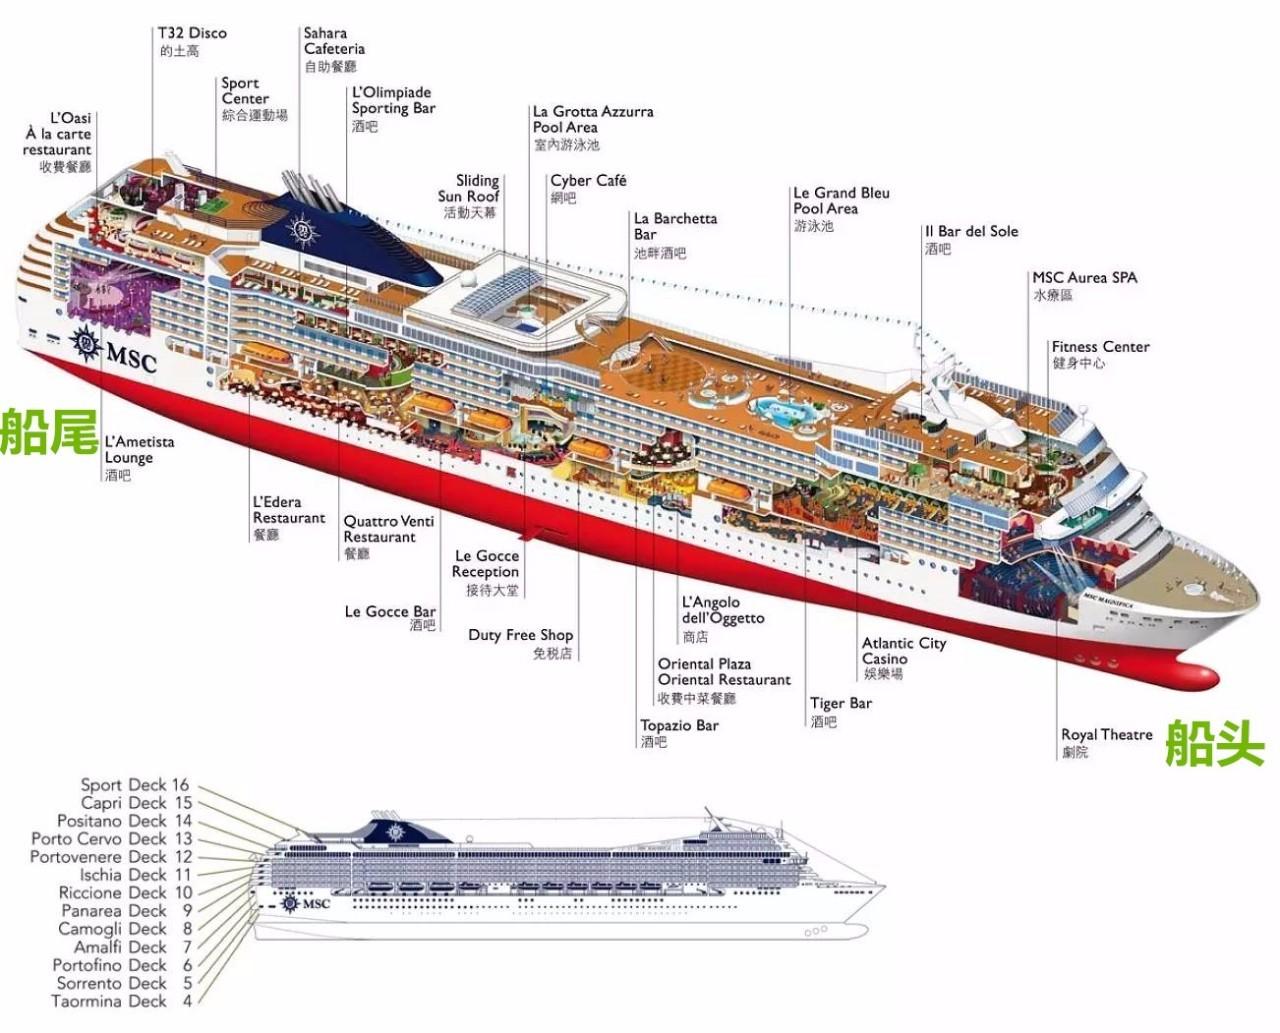 20191126 cruise map.jpg